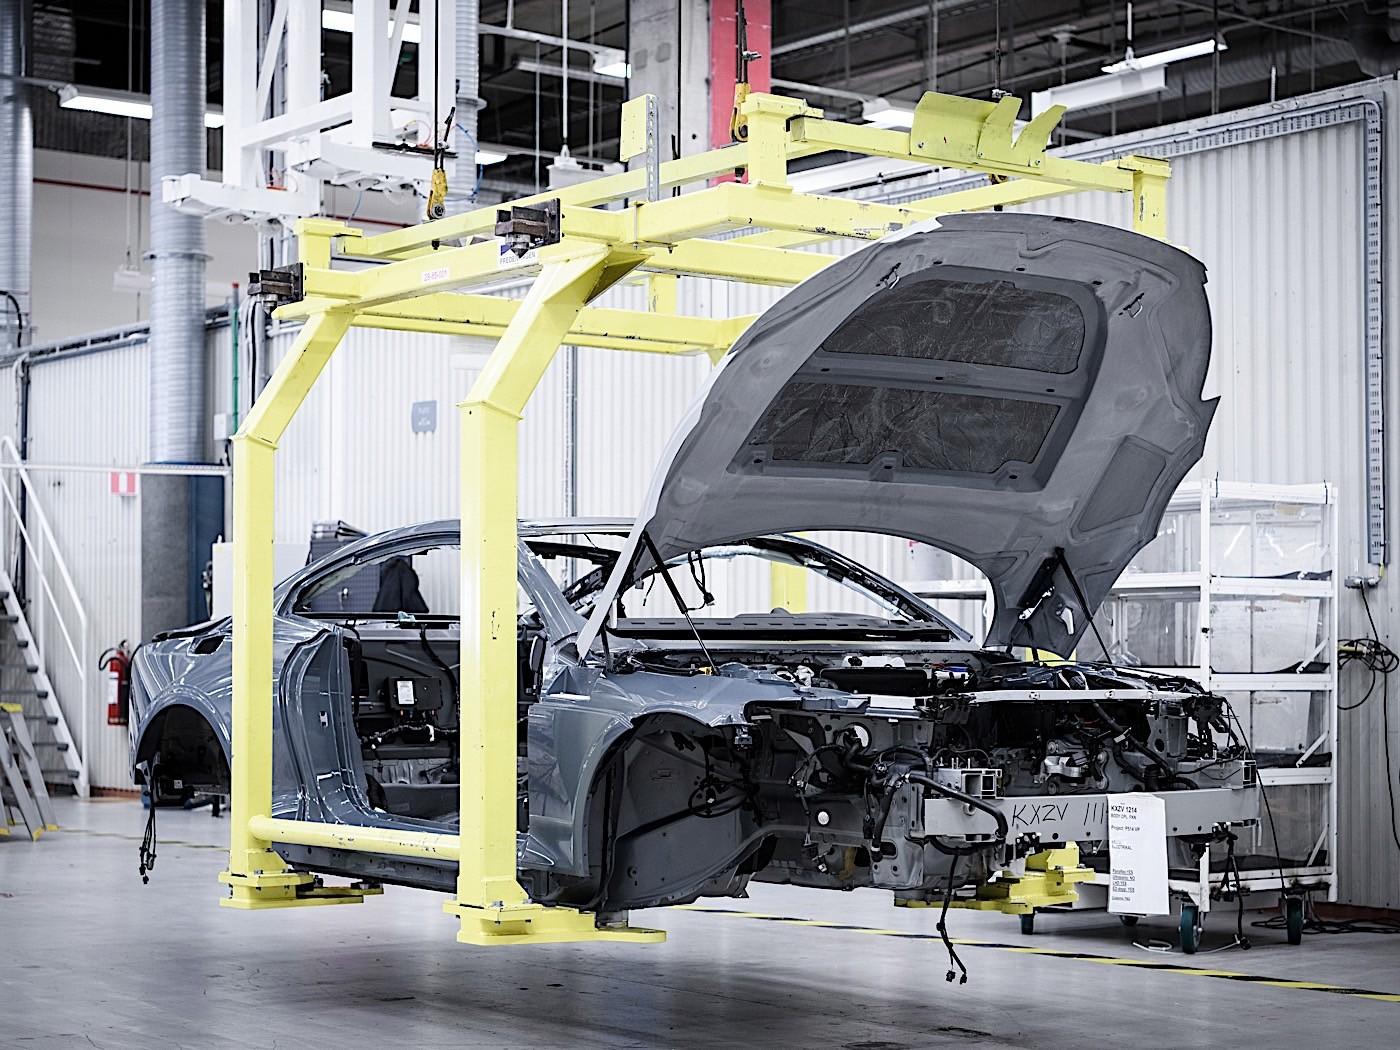 Polestar crash test focuses on carbon body